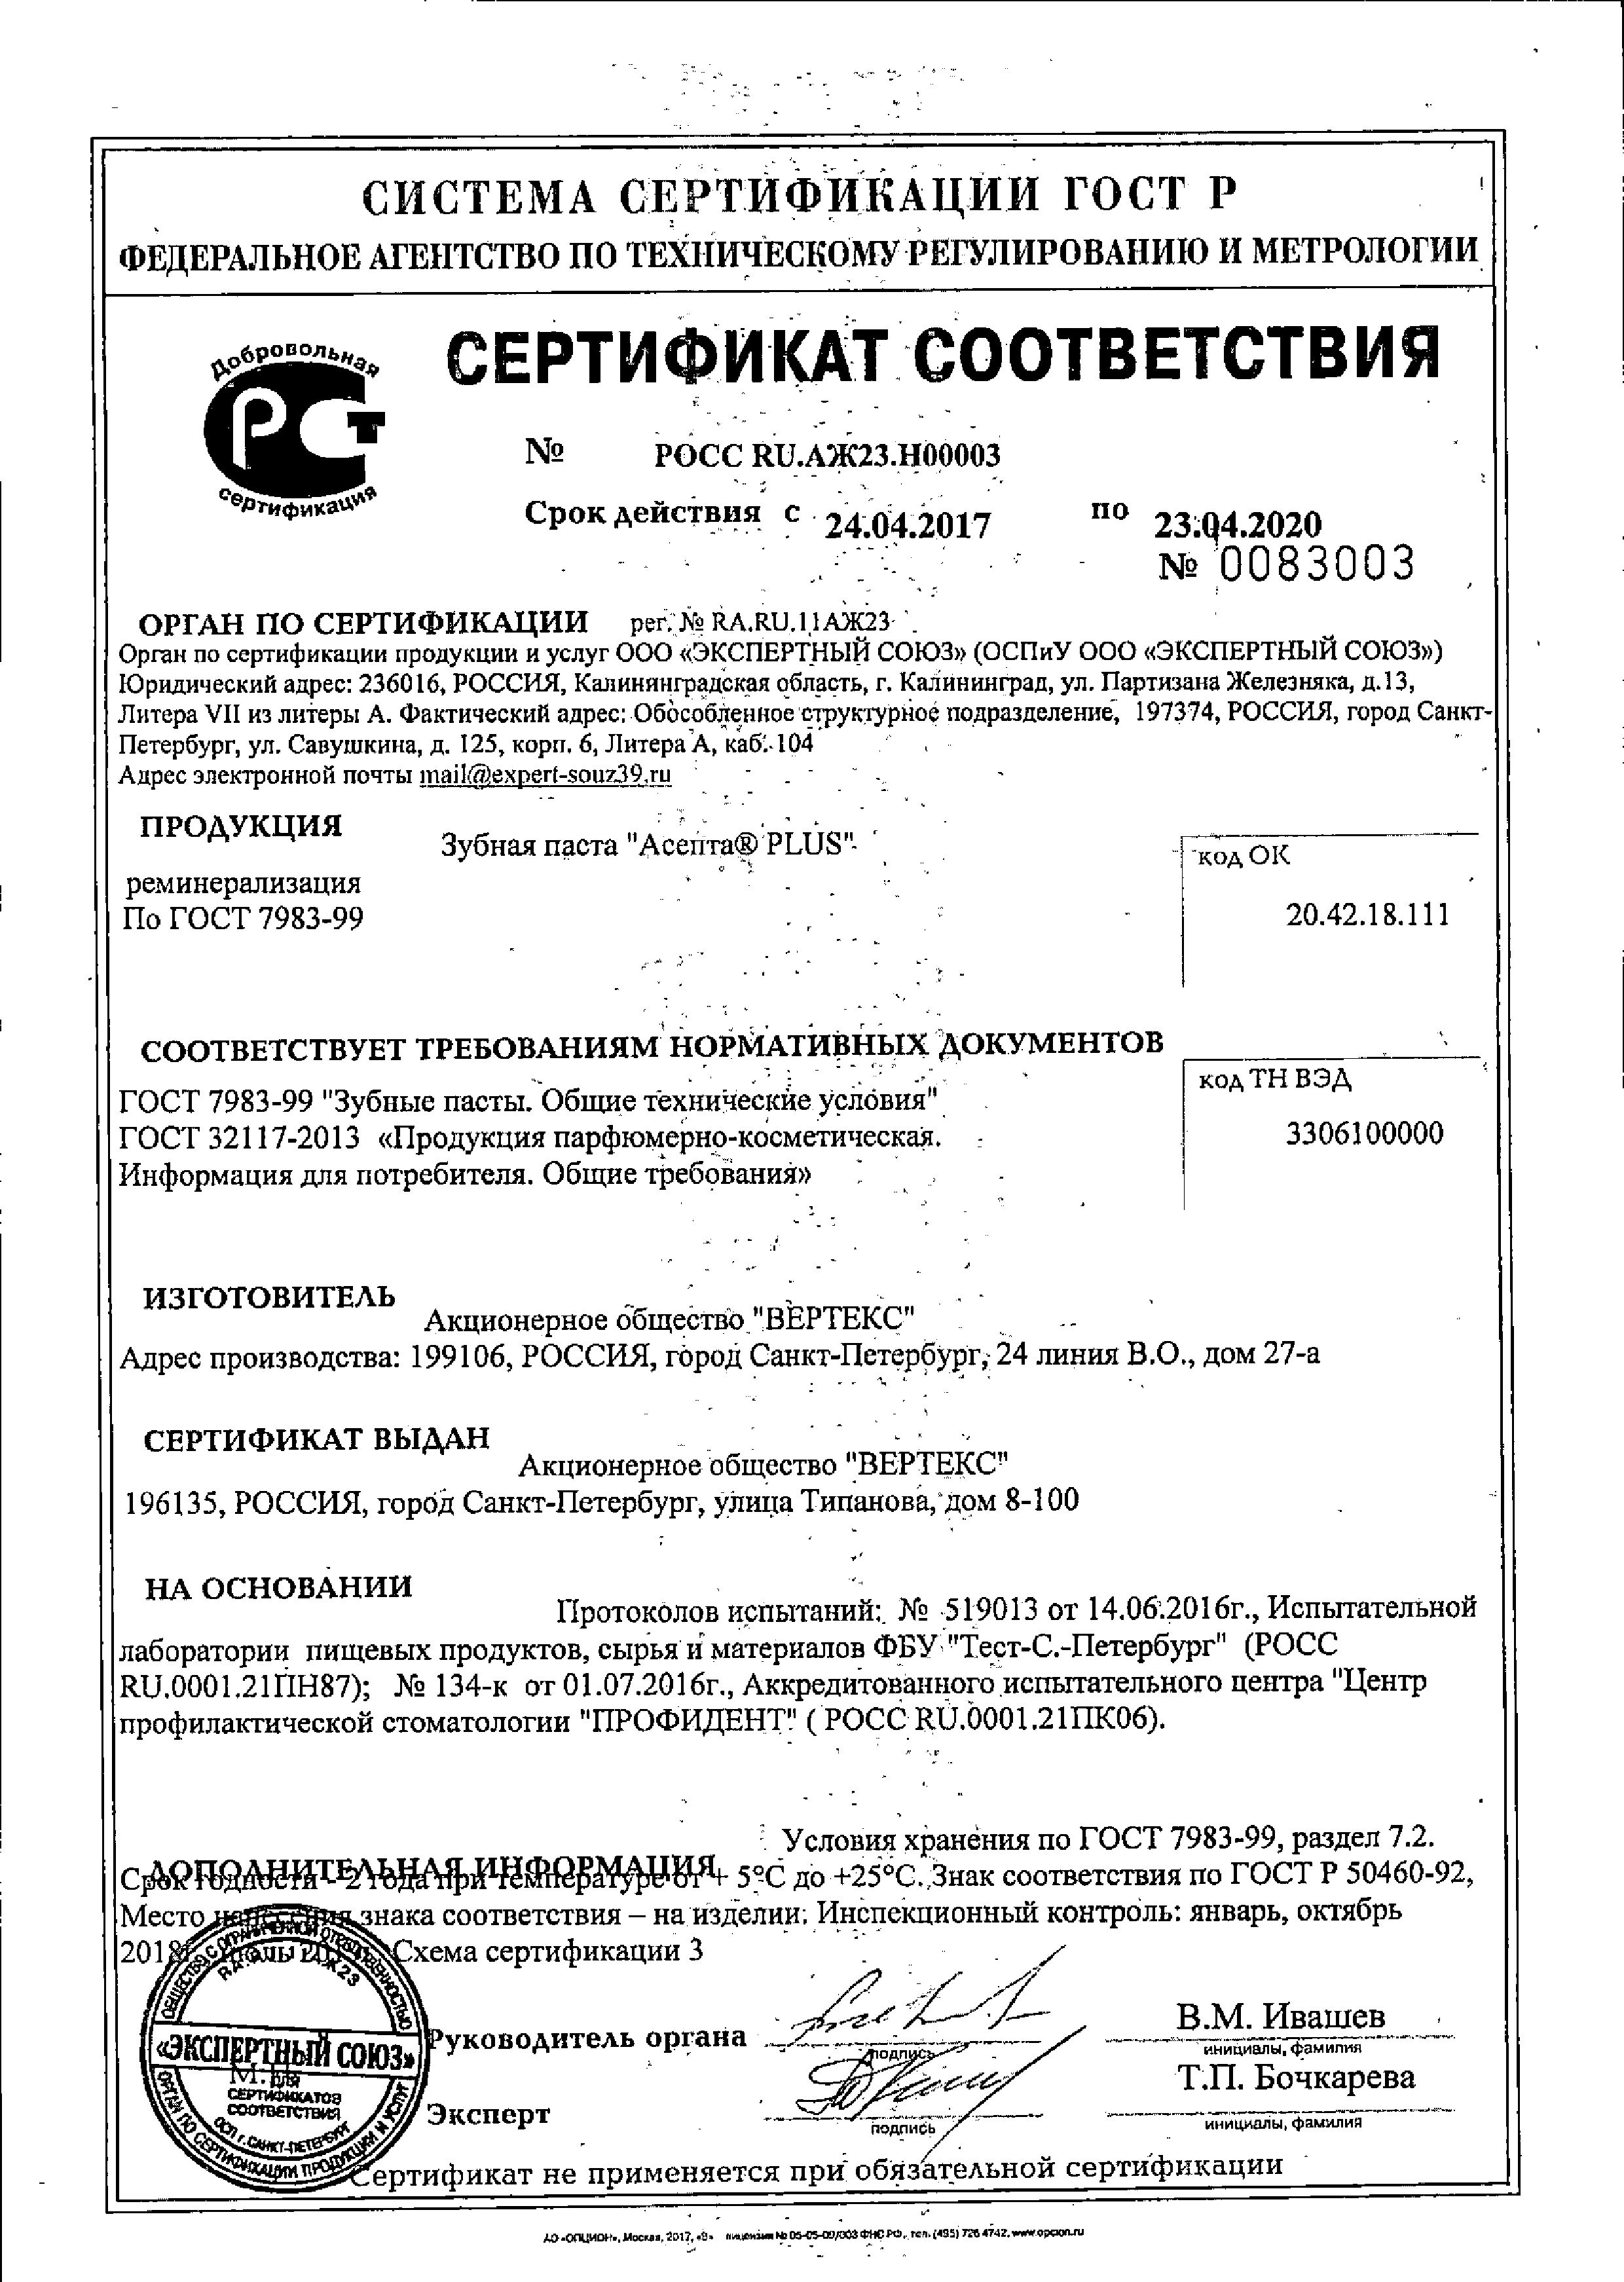 Асепта Plus Реминерализация сертификат